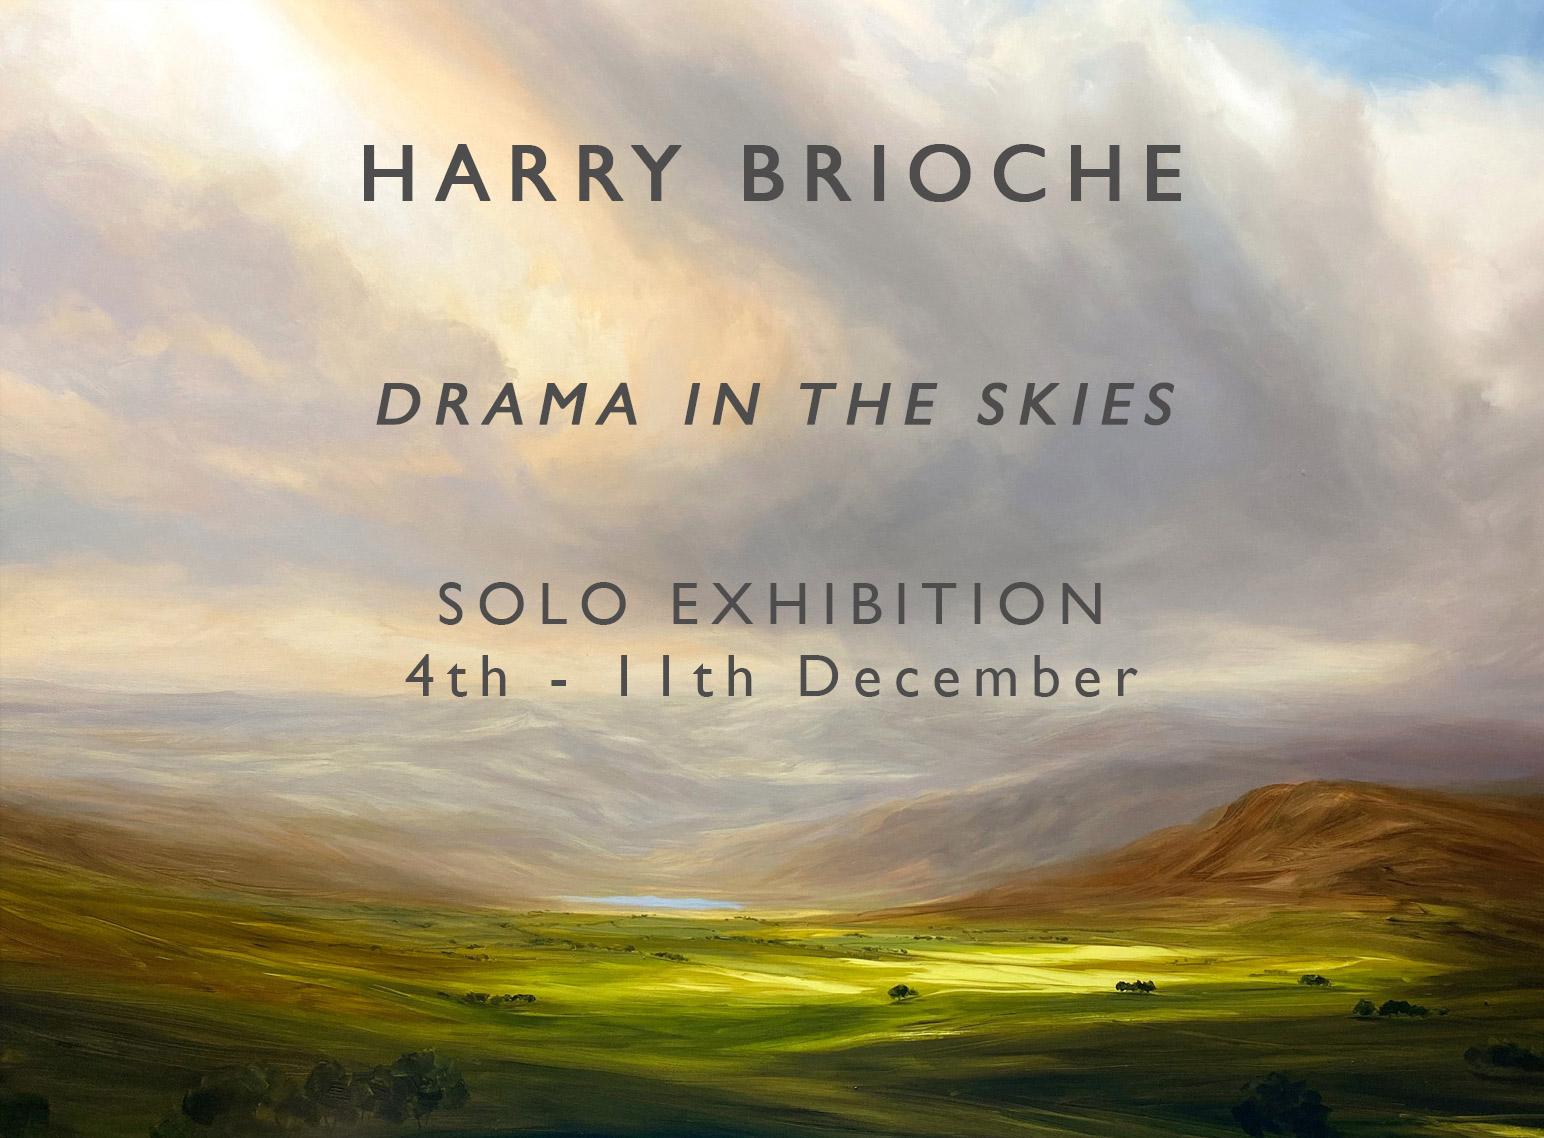 Harry Brioche Exhibition